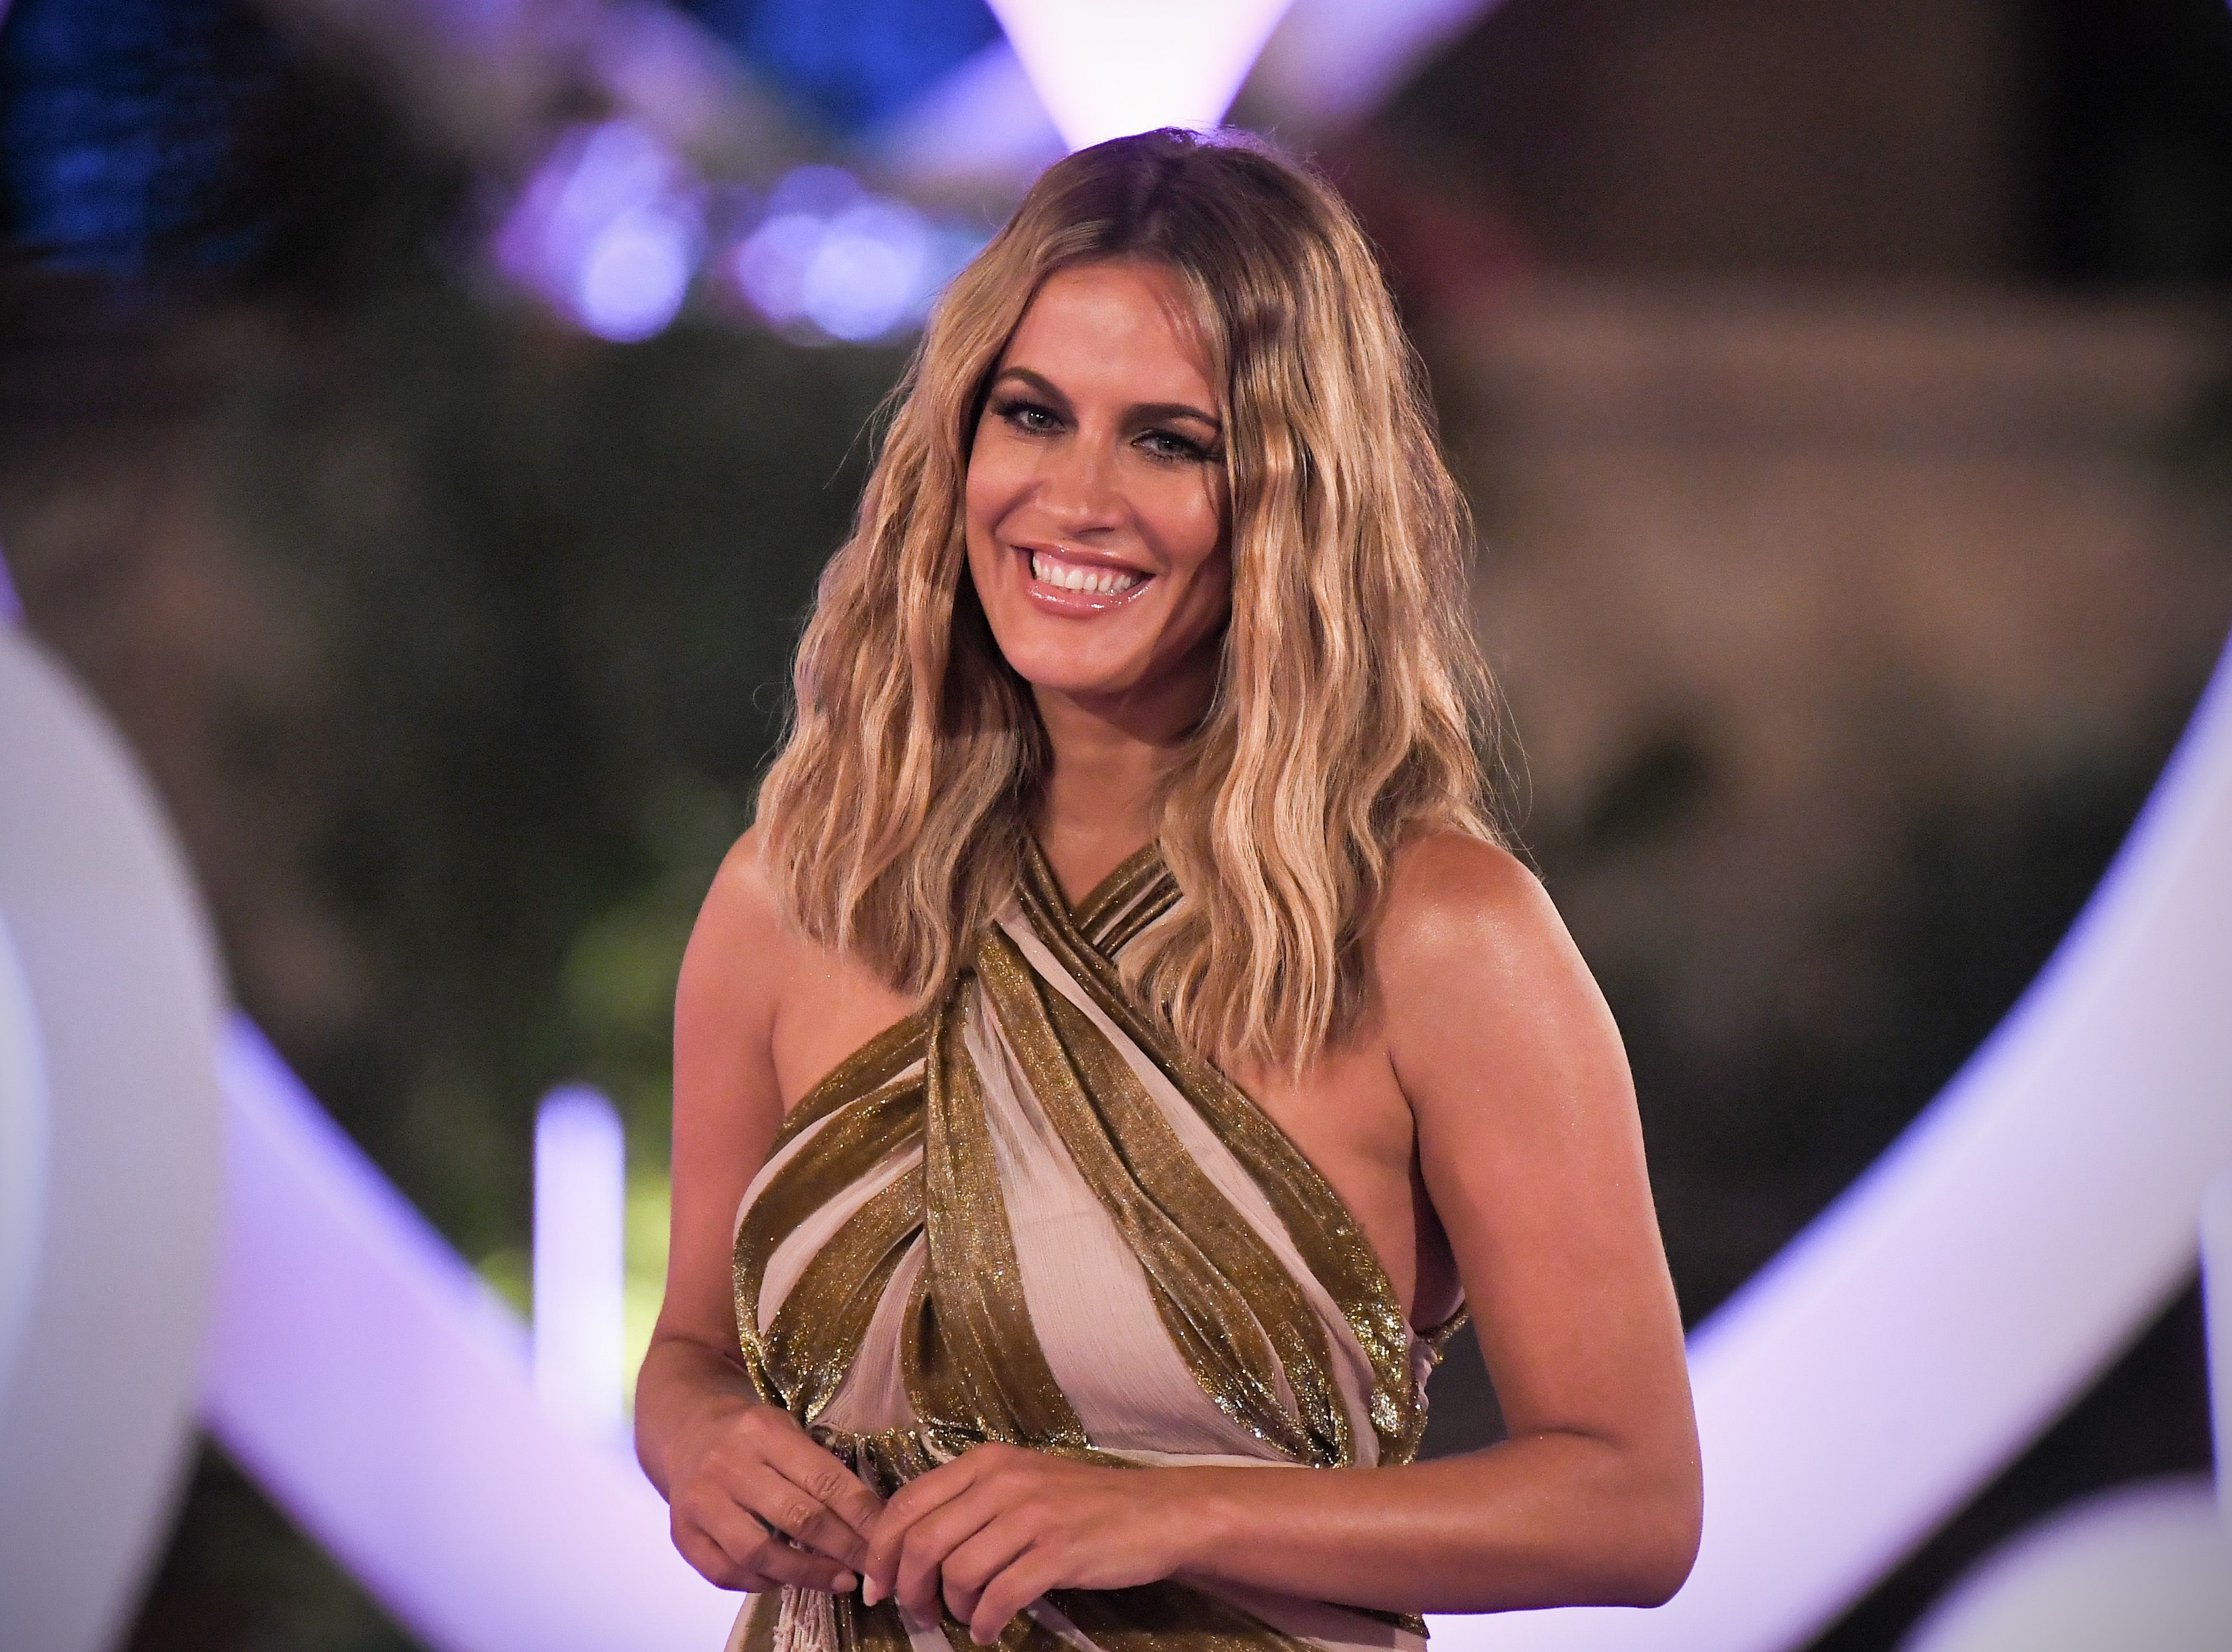 Caroline Flack will host 'Love Island: The